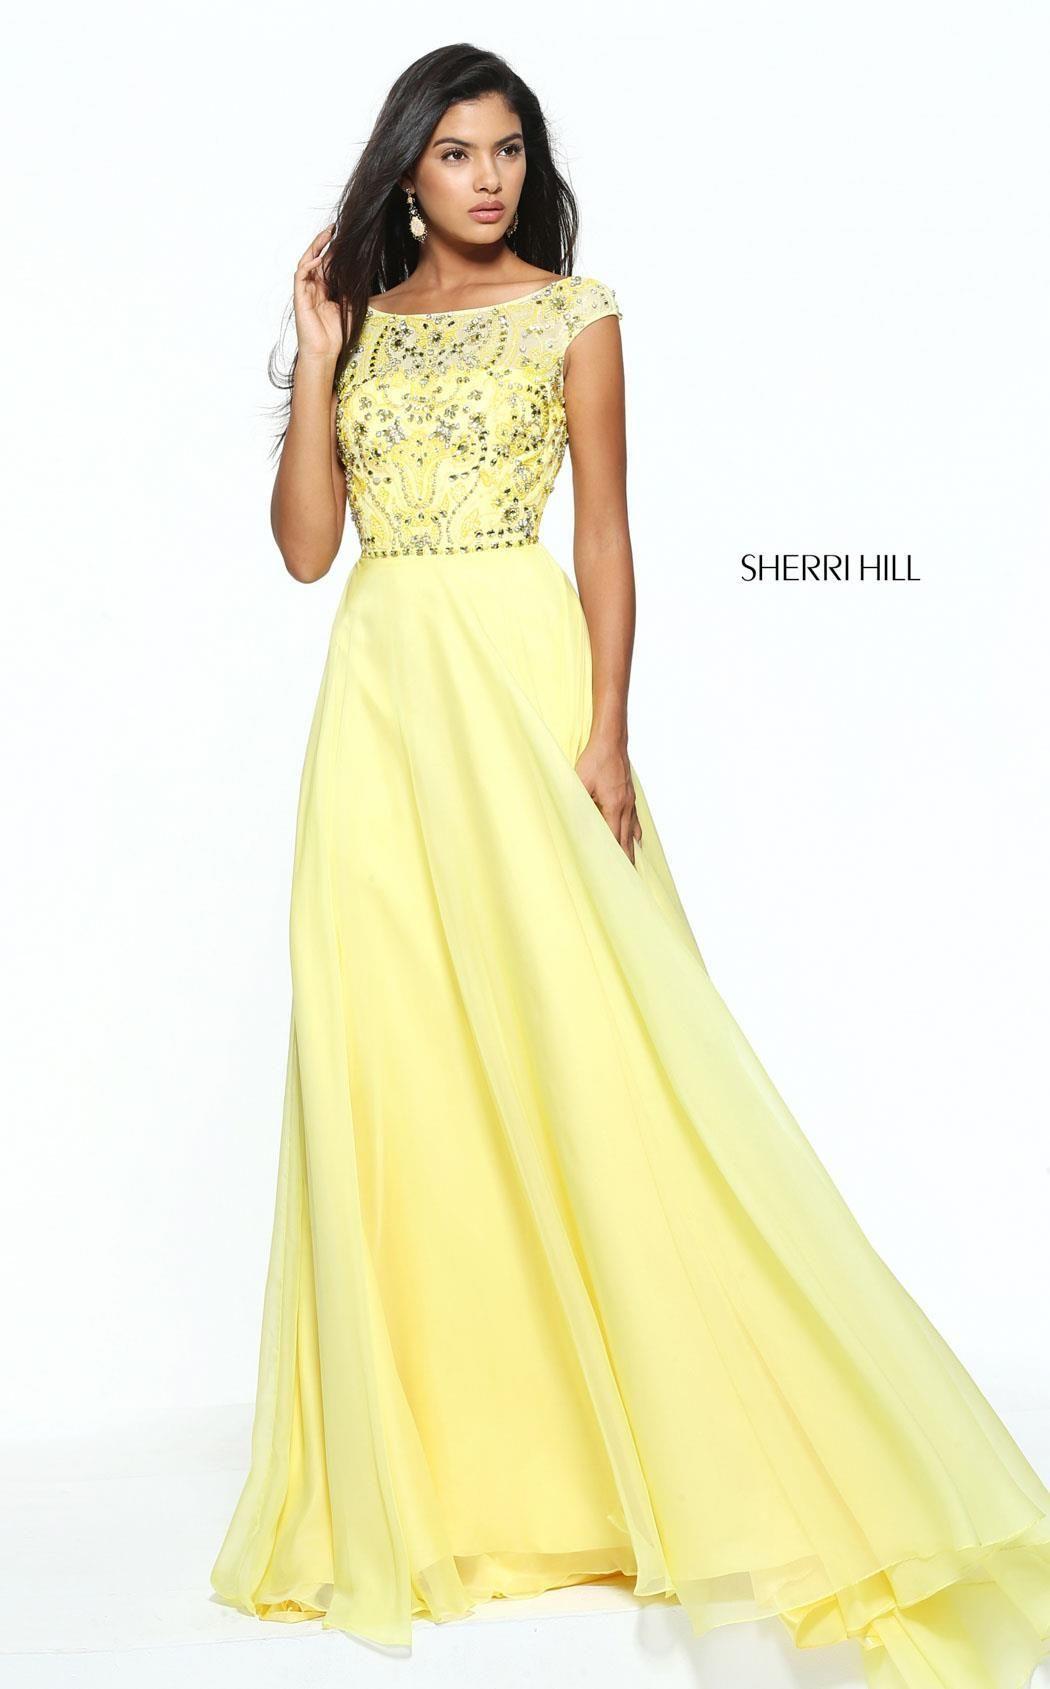 Sherri hill dresses pinterest prom dresses dresses and